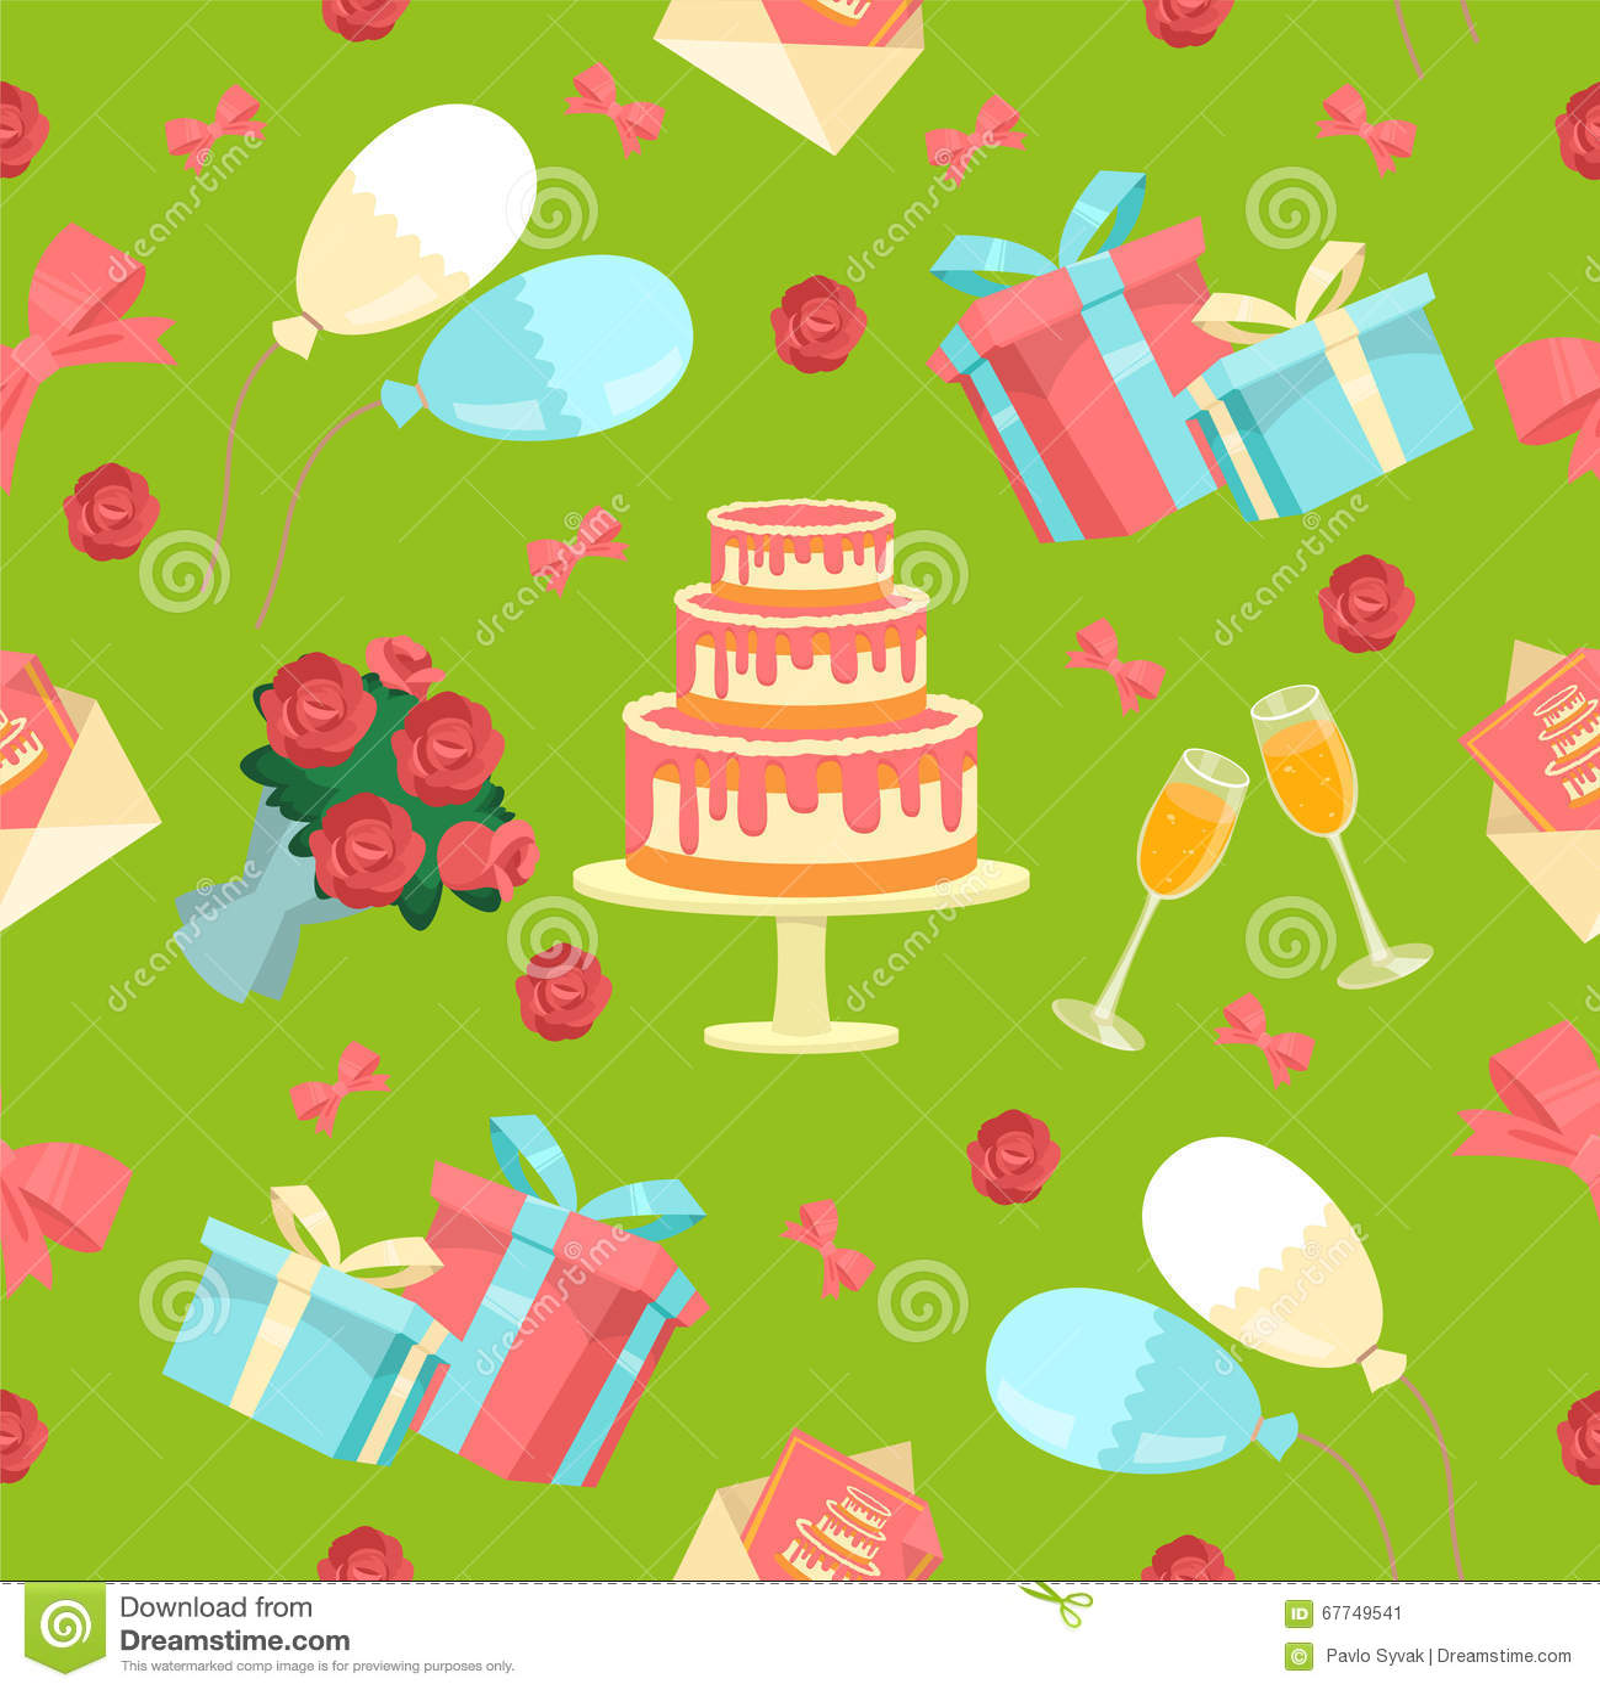 Happy birthday seamless pattern with cake stock vector happy birthday seamless pattern with cake izmirmasajfo